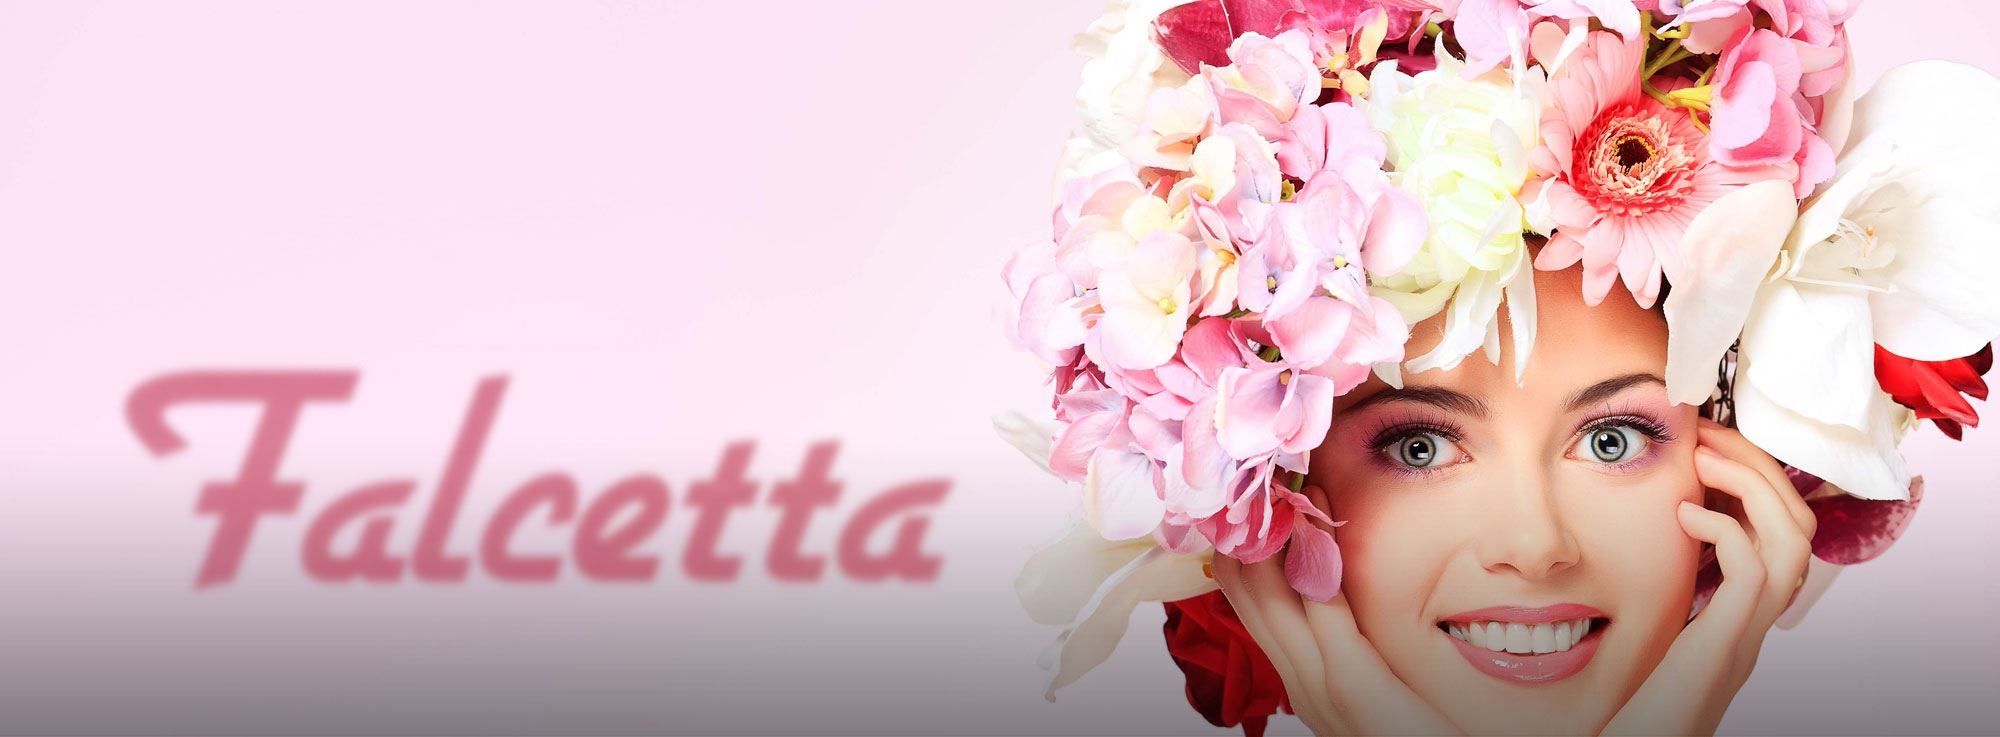 Falcetta Barletta